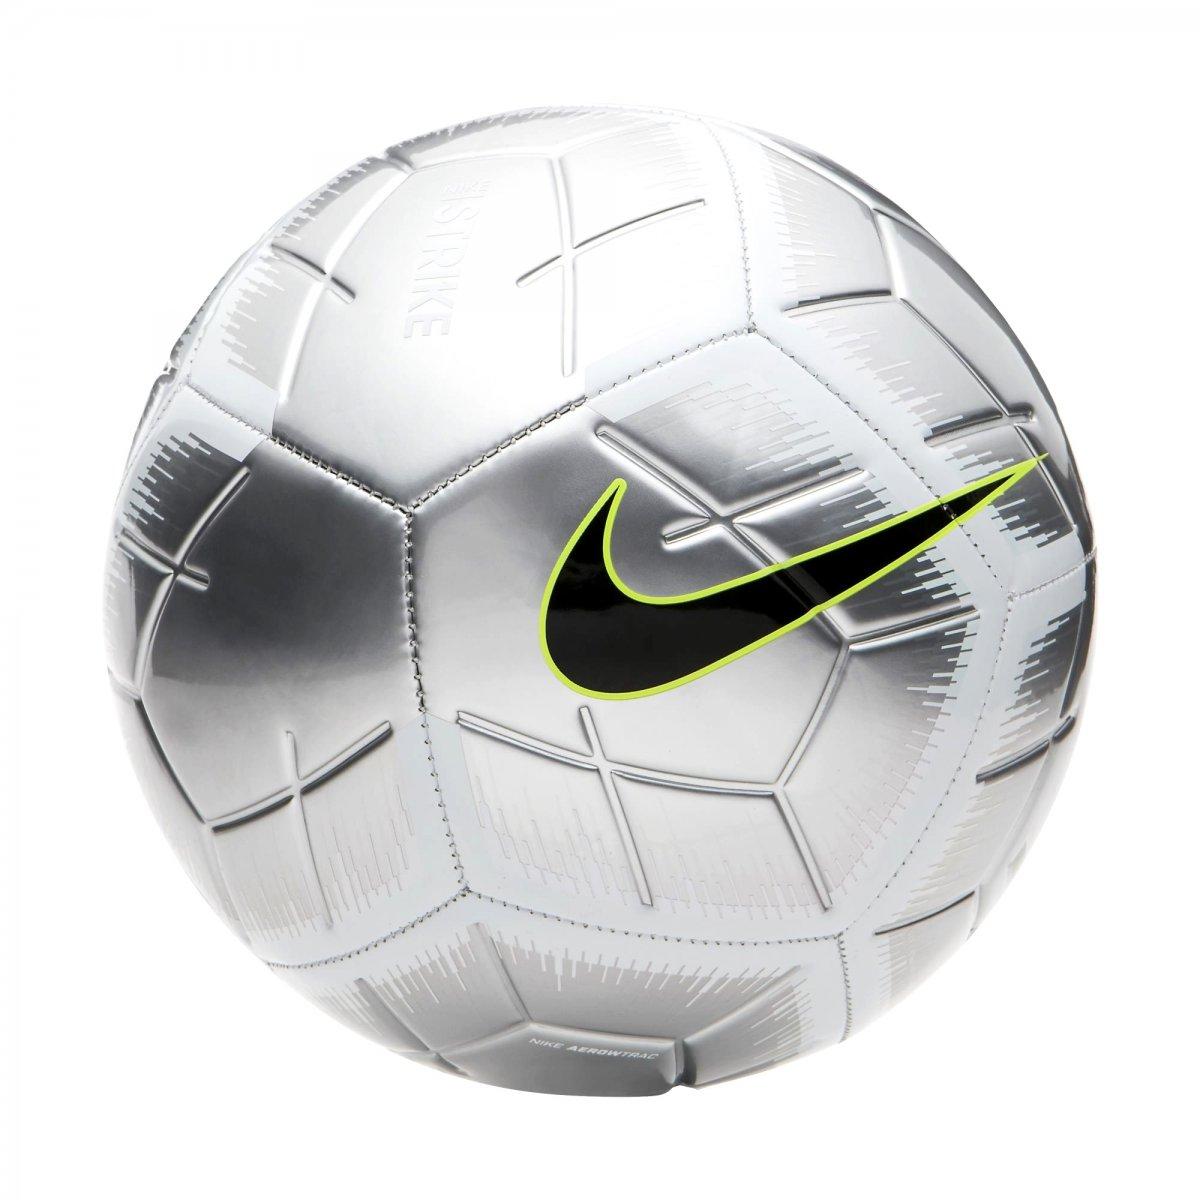 95332d8b4 Bola Campo Nike Strike Event Pack SC3496 026 - Prata - Botas Online ...